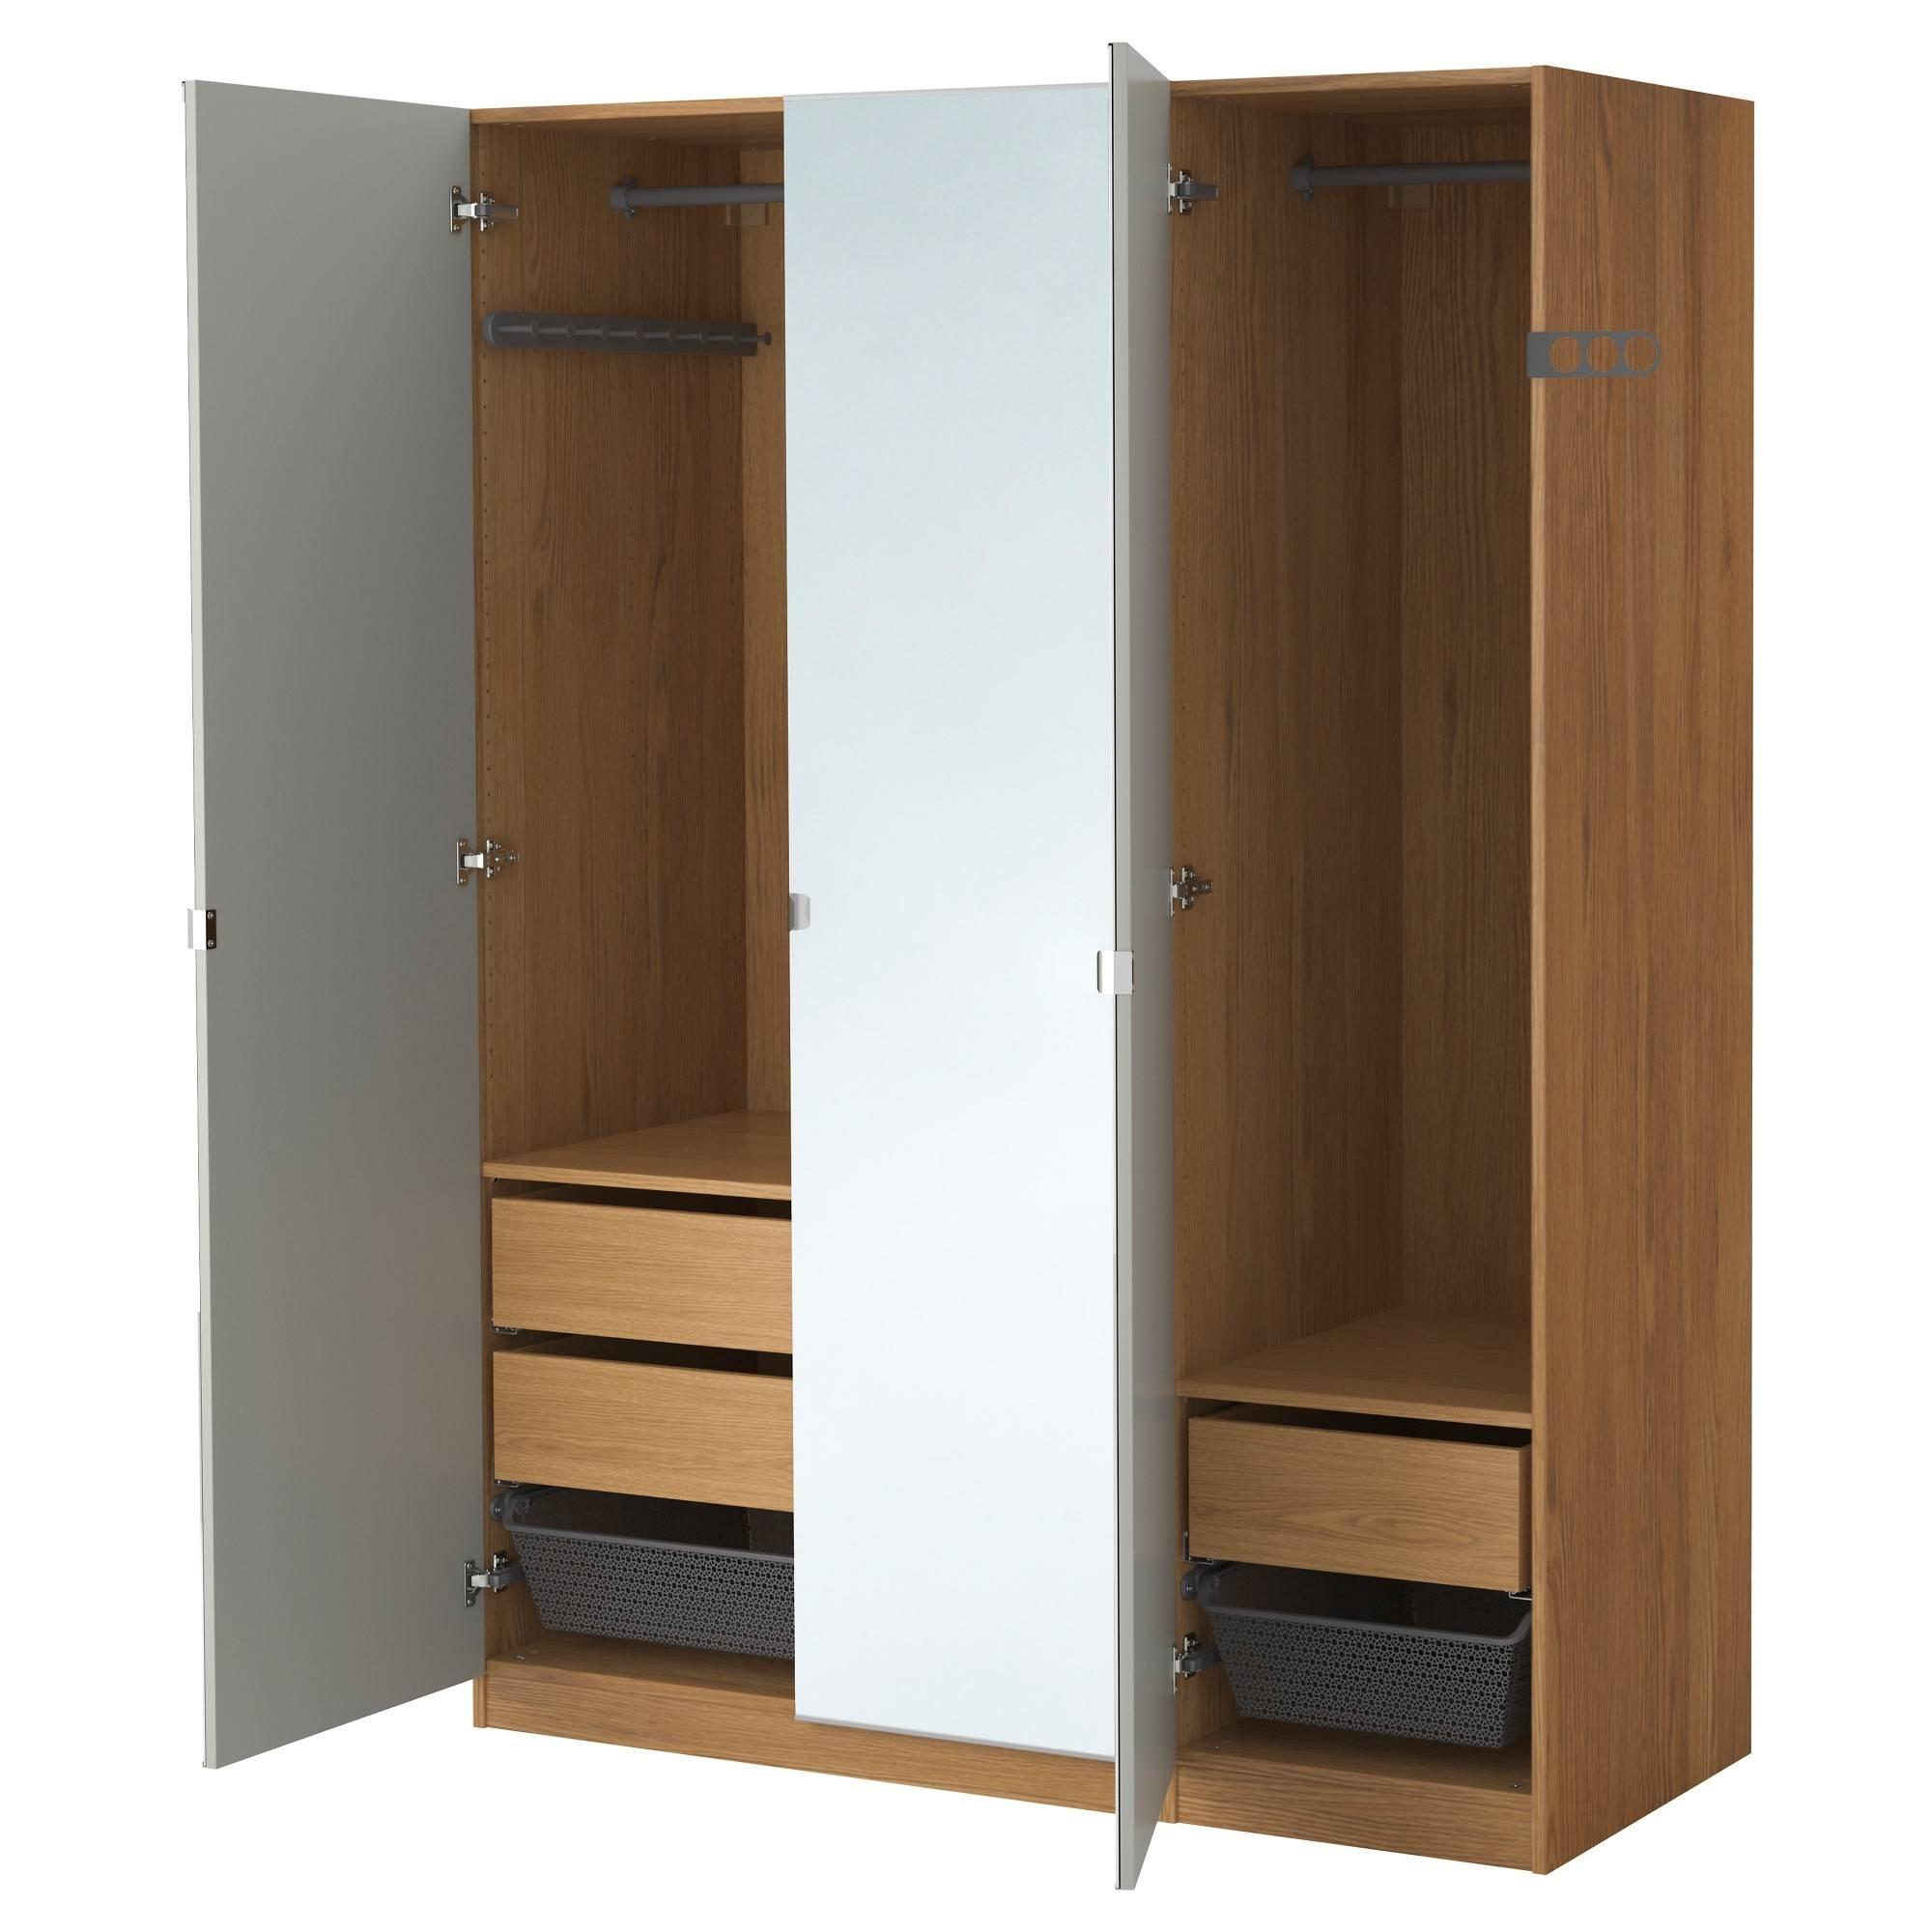 Hemnes Wardrobe With 3 Doors Black Brown pertaining to Brown Wardrobes (Image 6 of 15)